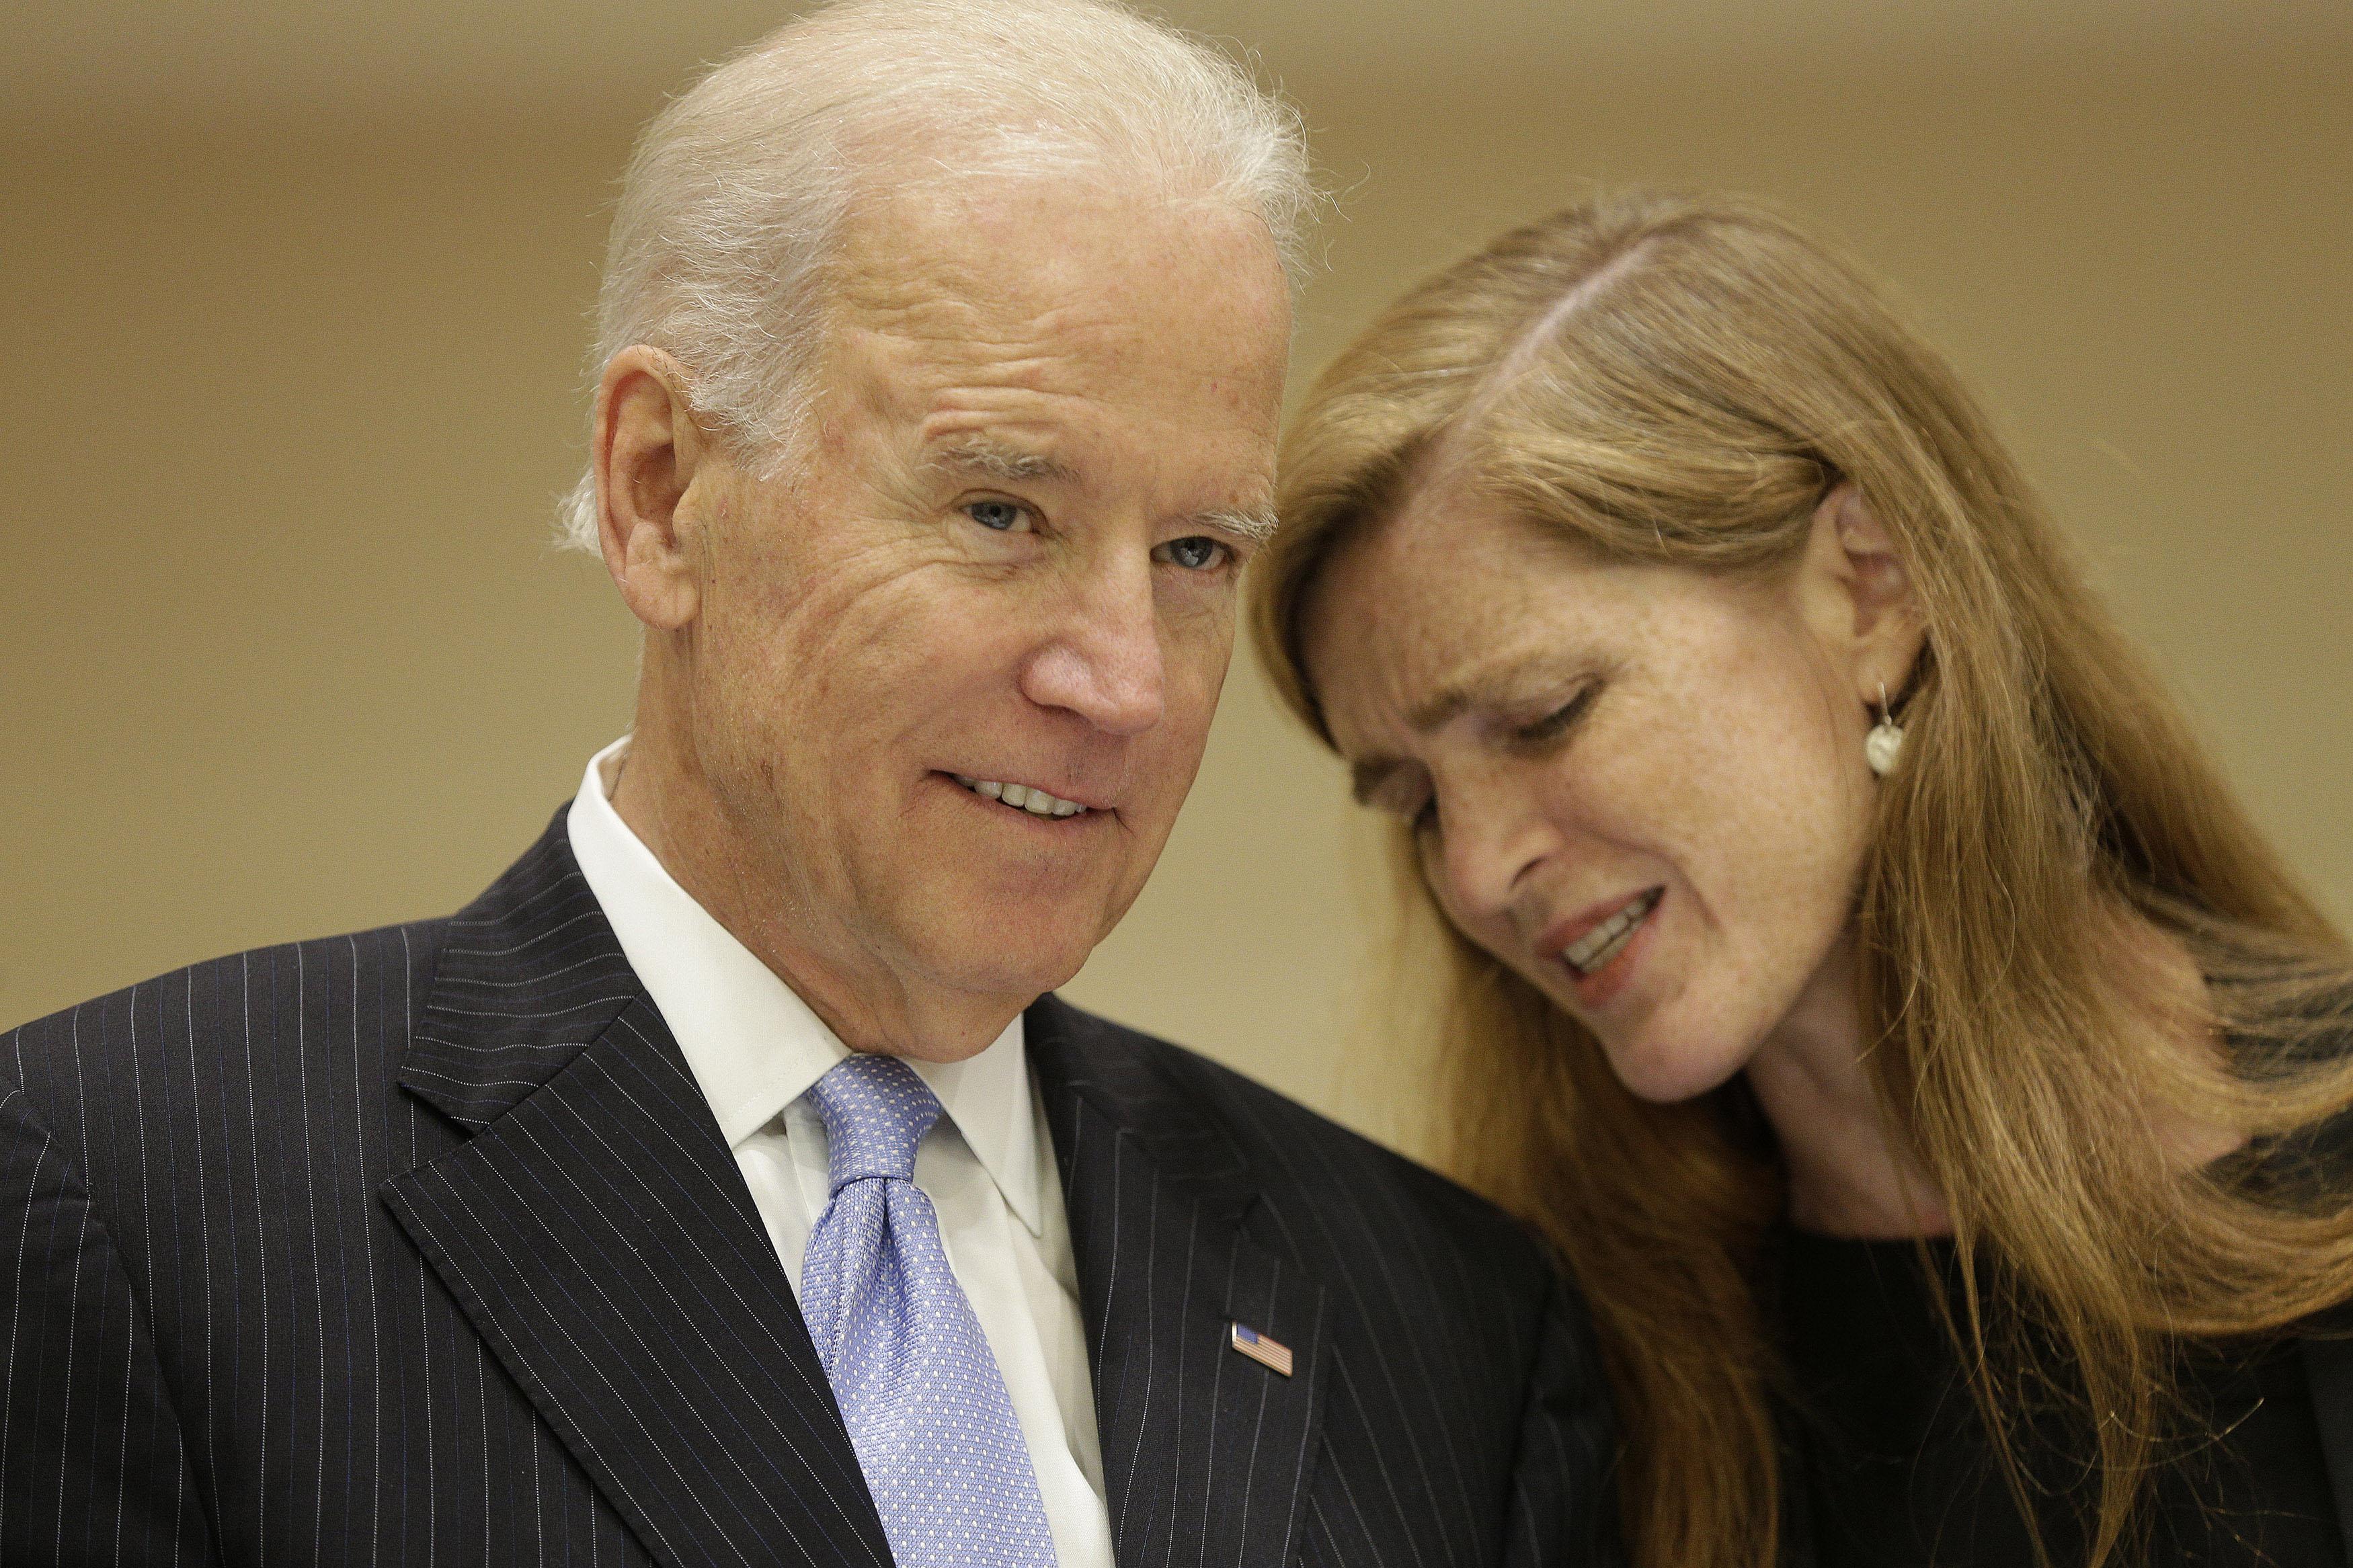 Former UN ambassador Samantha Power on why she has 'nothing but respect' for Joe Biden